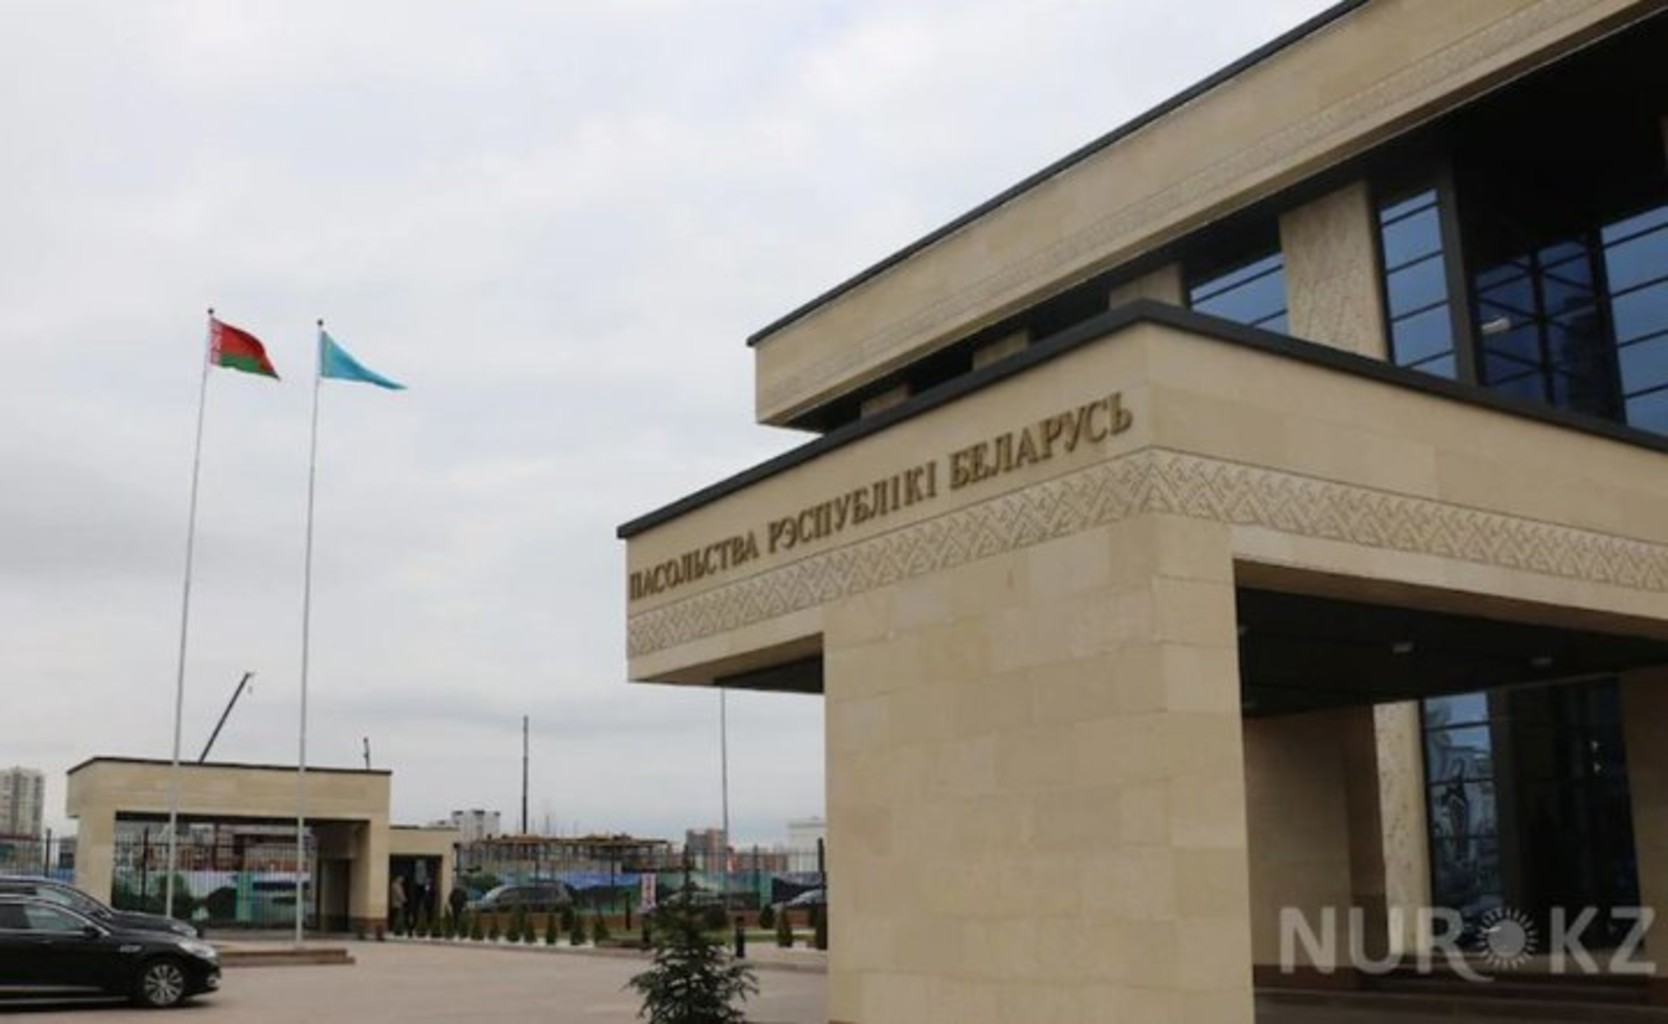 Posolstvo belarusi v kazakhstane24 3